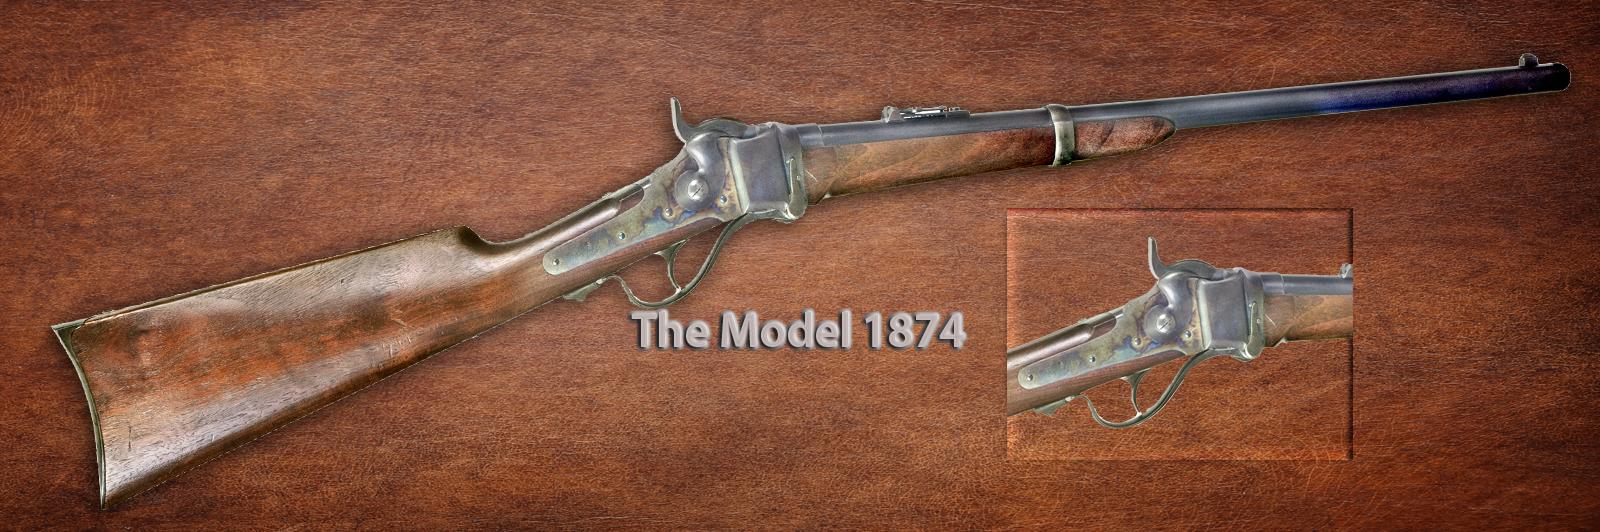 Model 1874